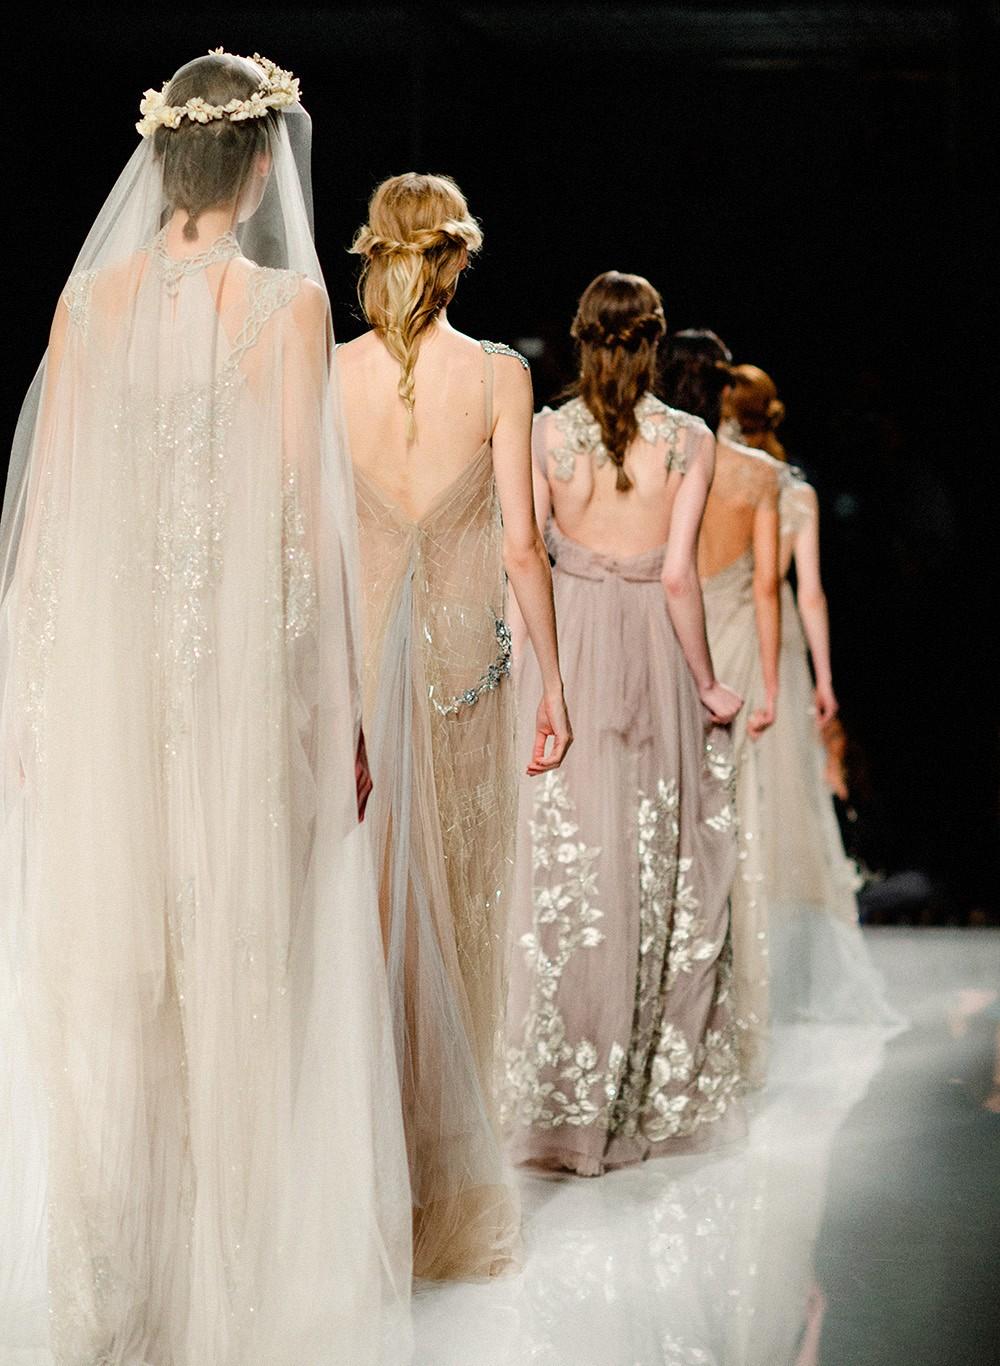 Margo and Maria - Barcelona Bridal Week 2016